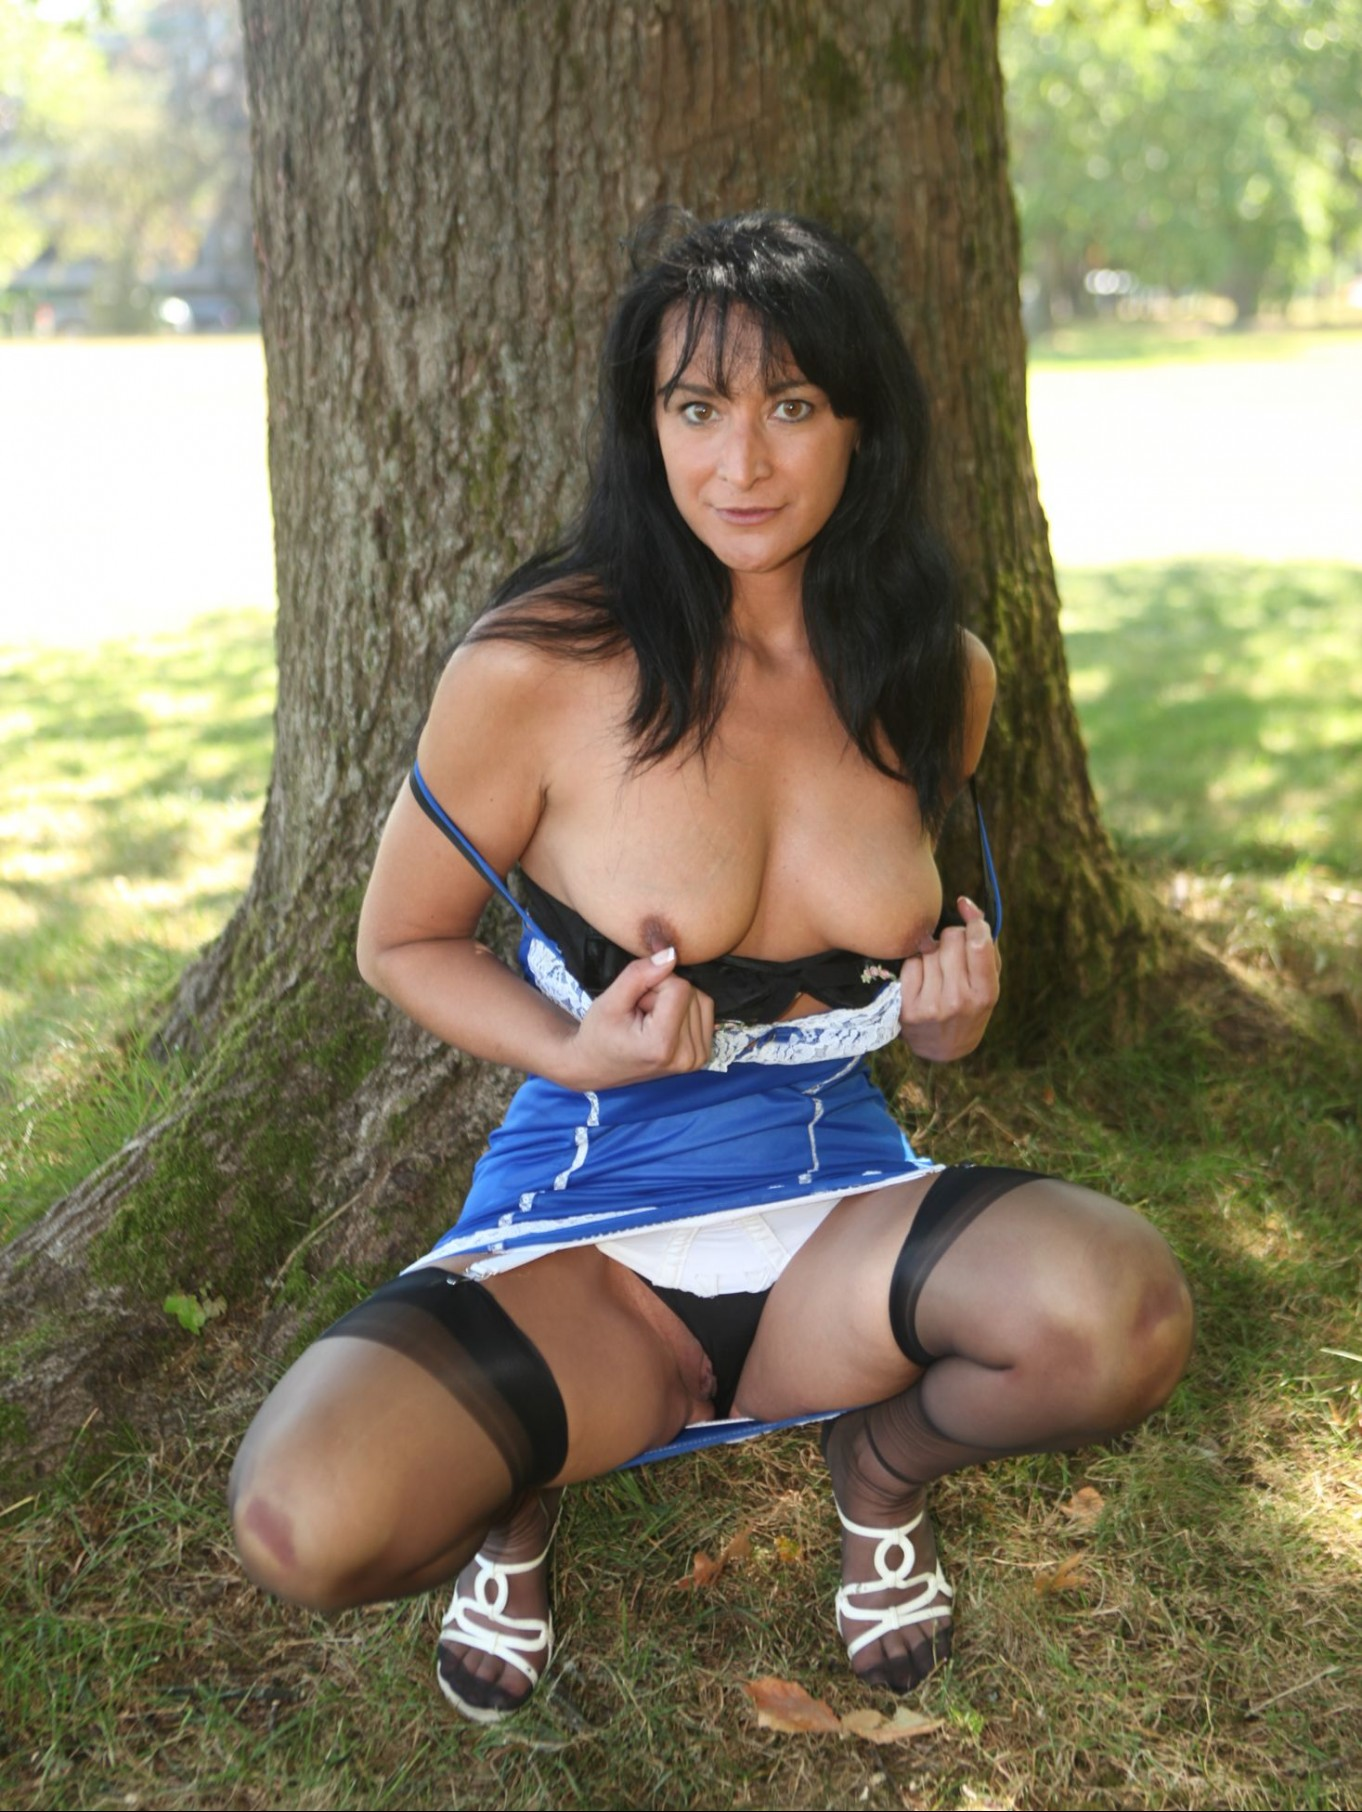 Sandra bullock naked in the proposal